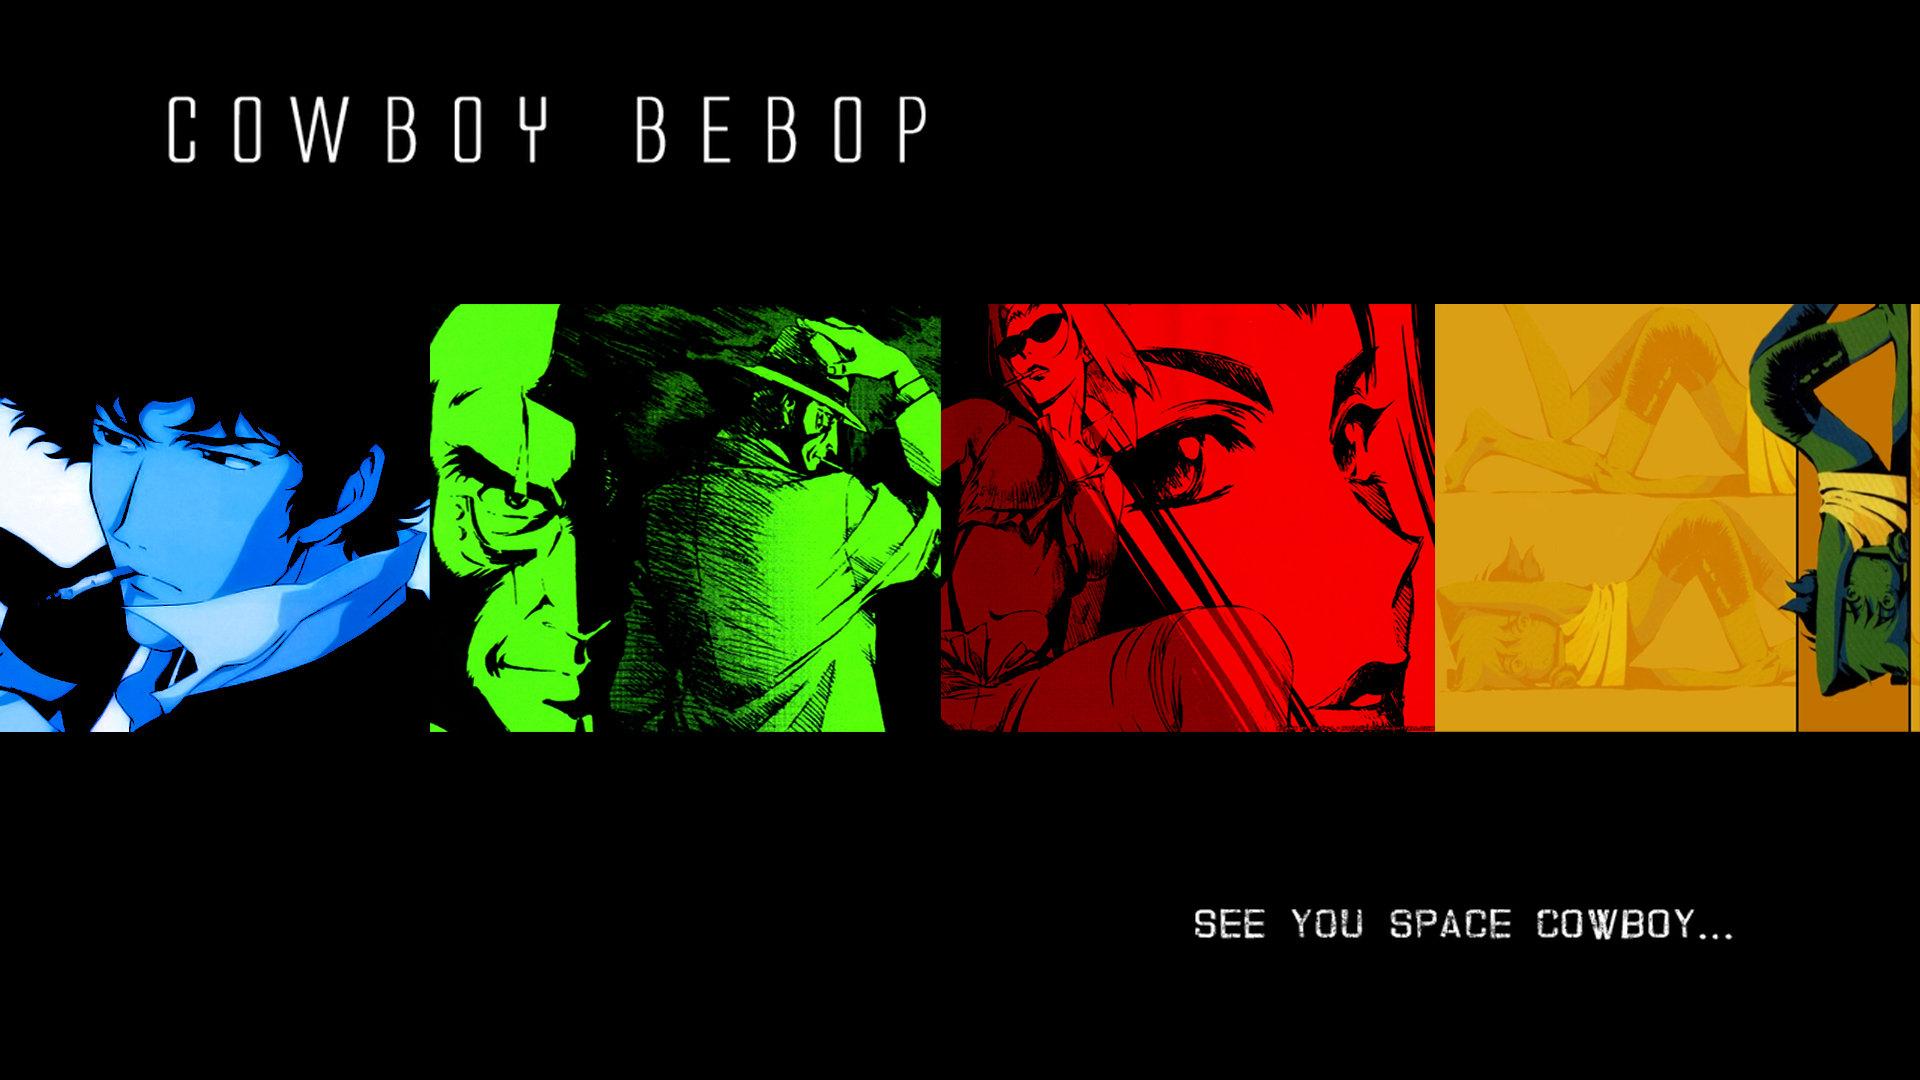 Cowboy Bebop Wallpapers 1920x1080 Full HD 1080p Desktop Backgrounds